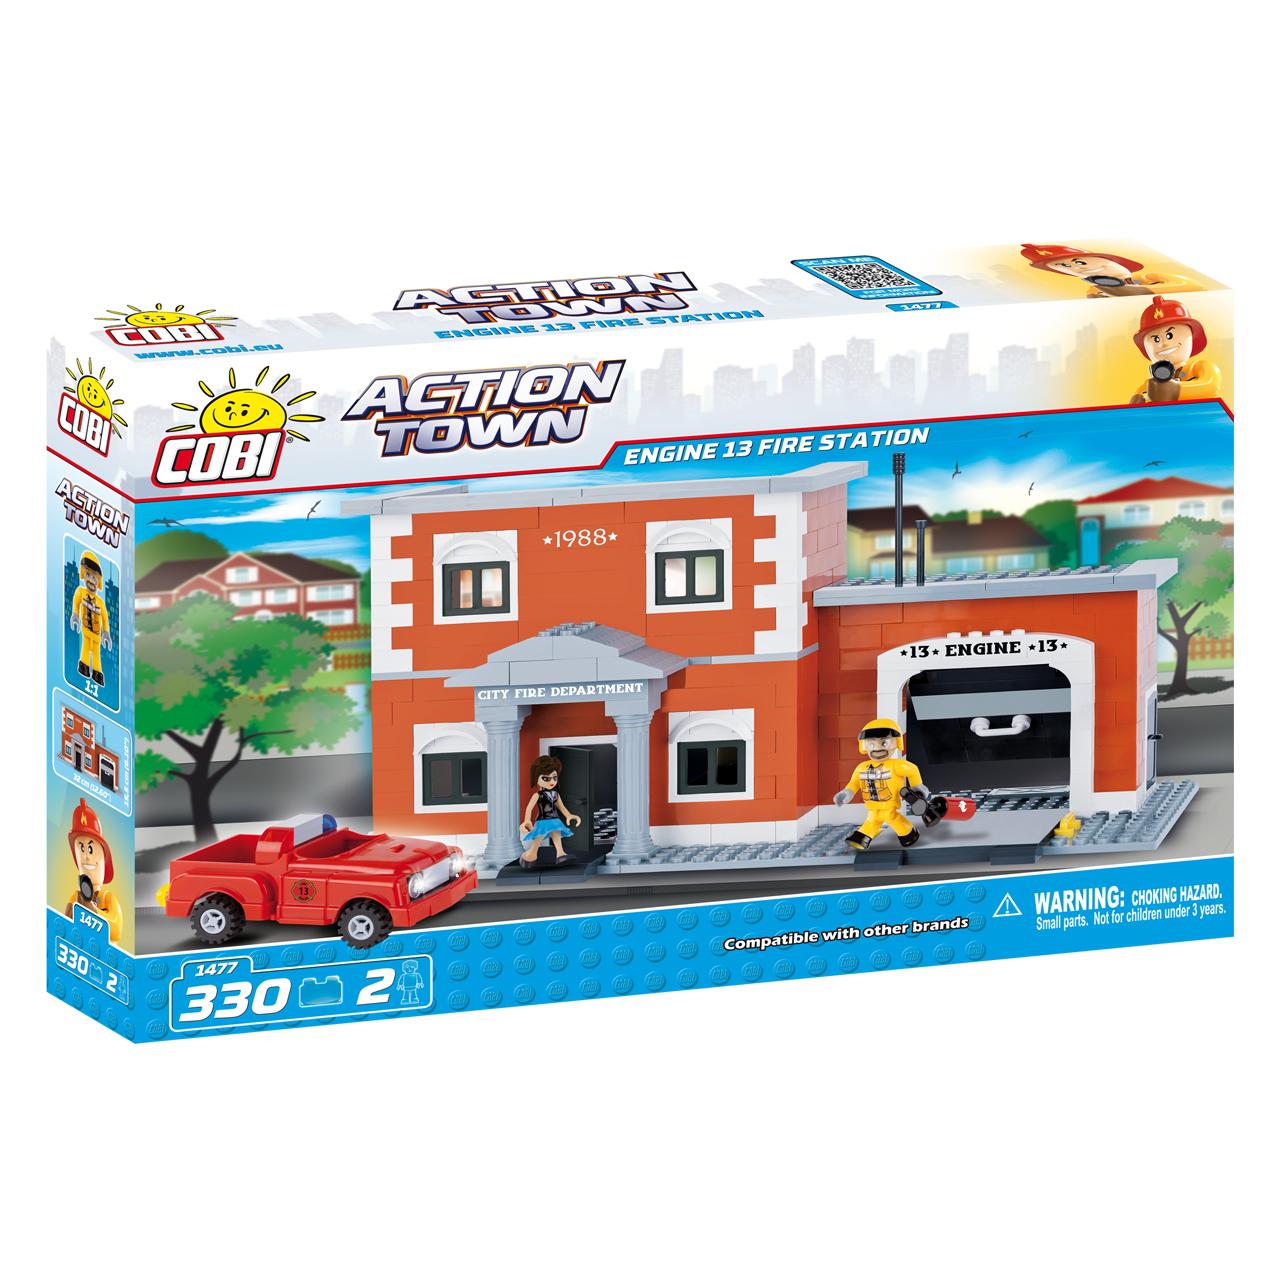 لگو کوبی مدل action town-engine13 fire station